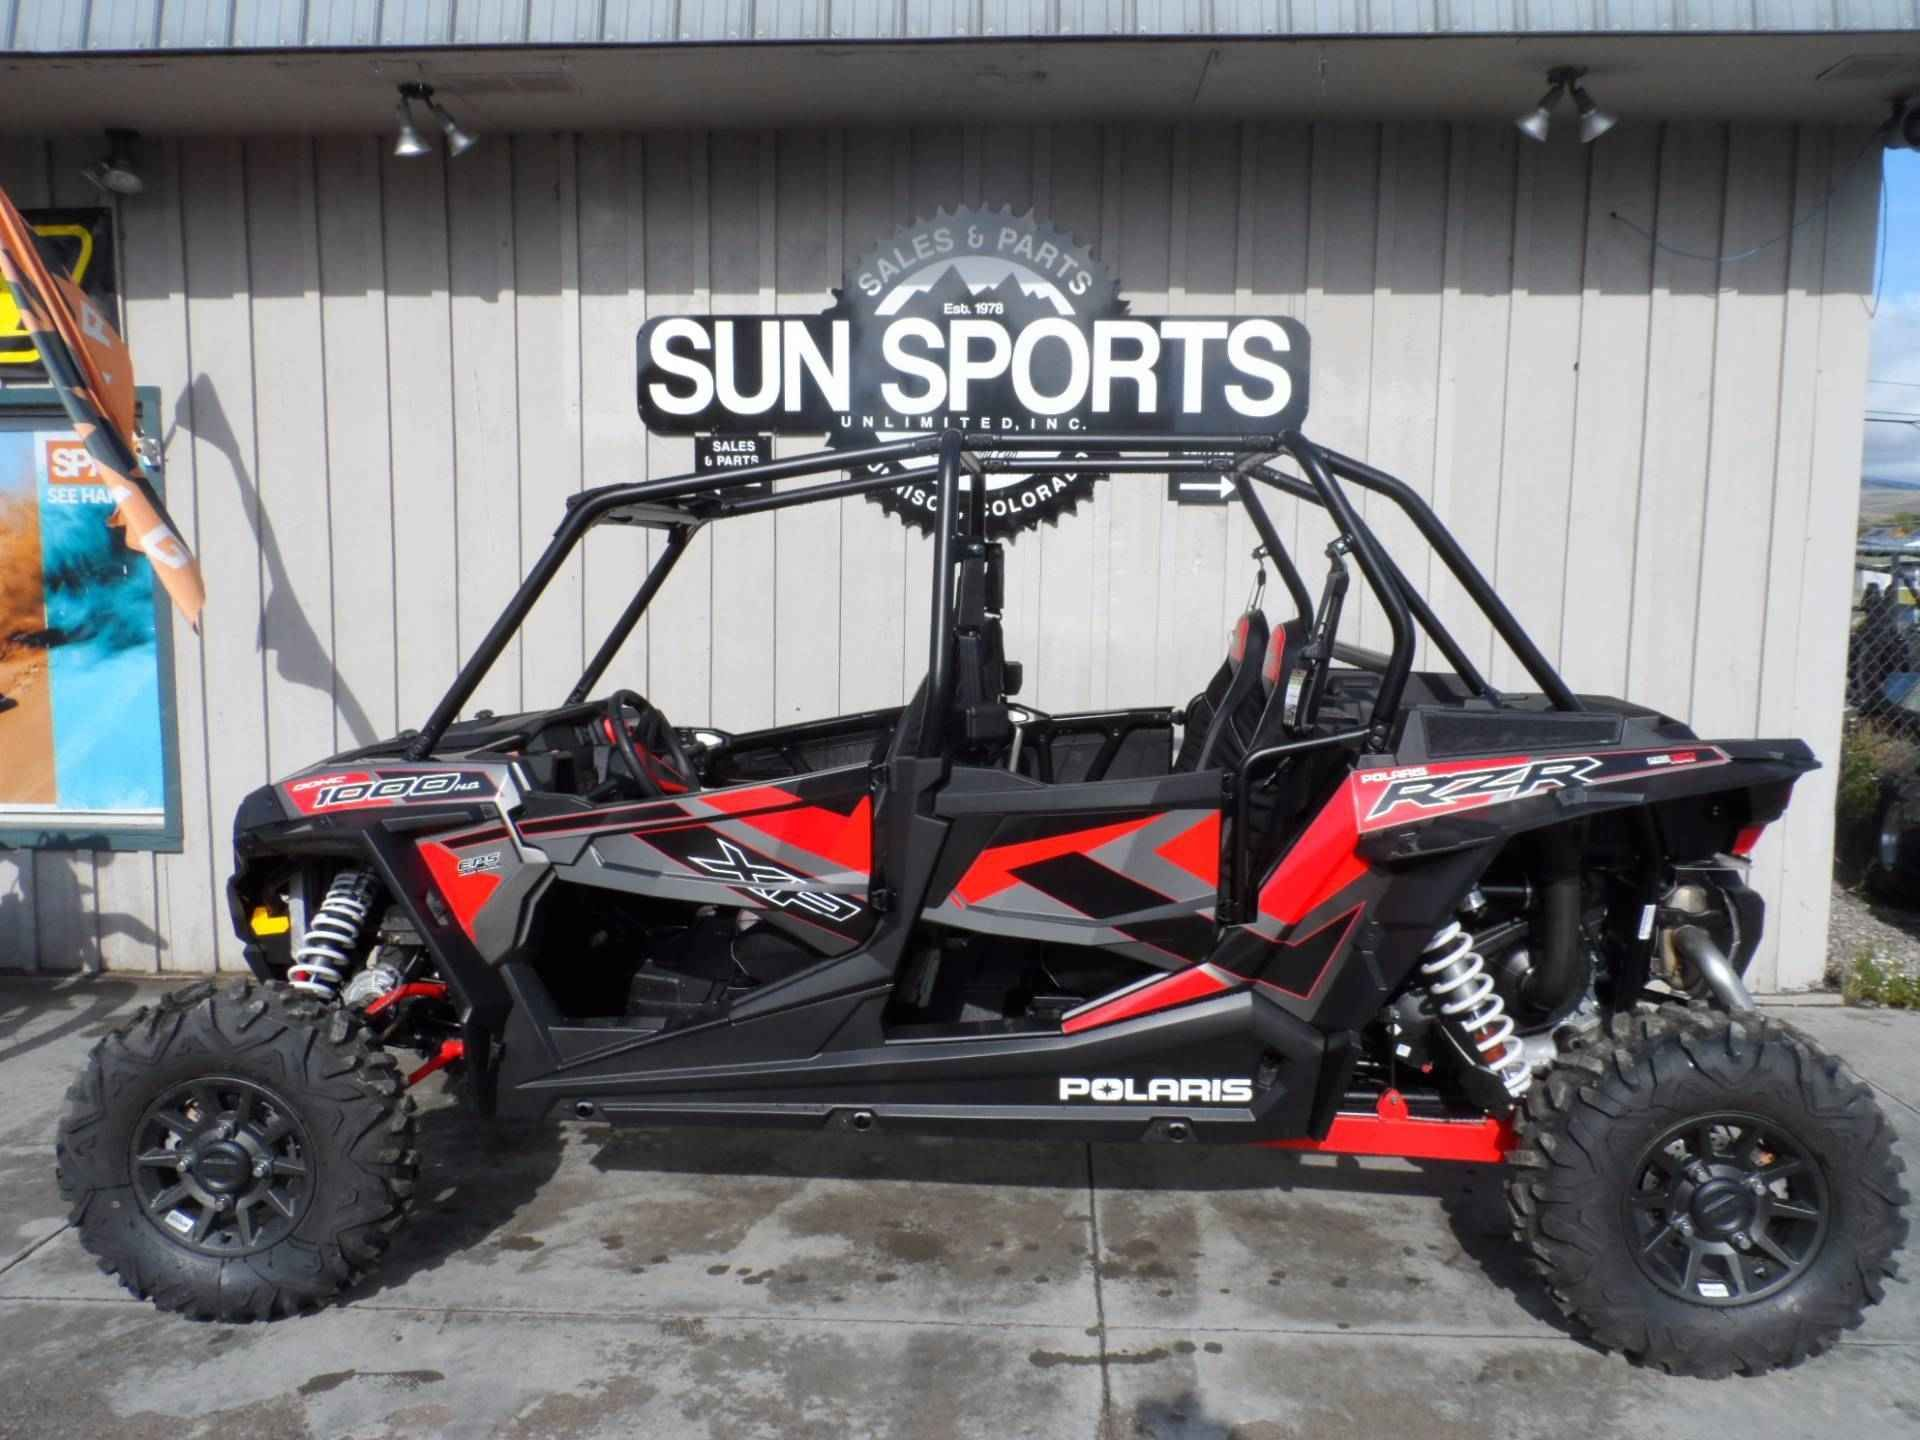 New 2017 Polaris RZR XP' 4 1000 EPS ATVs For Sale in Colorado